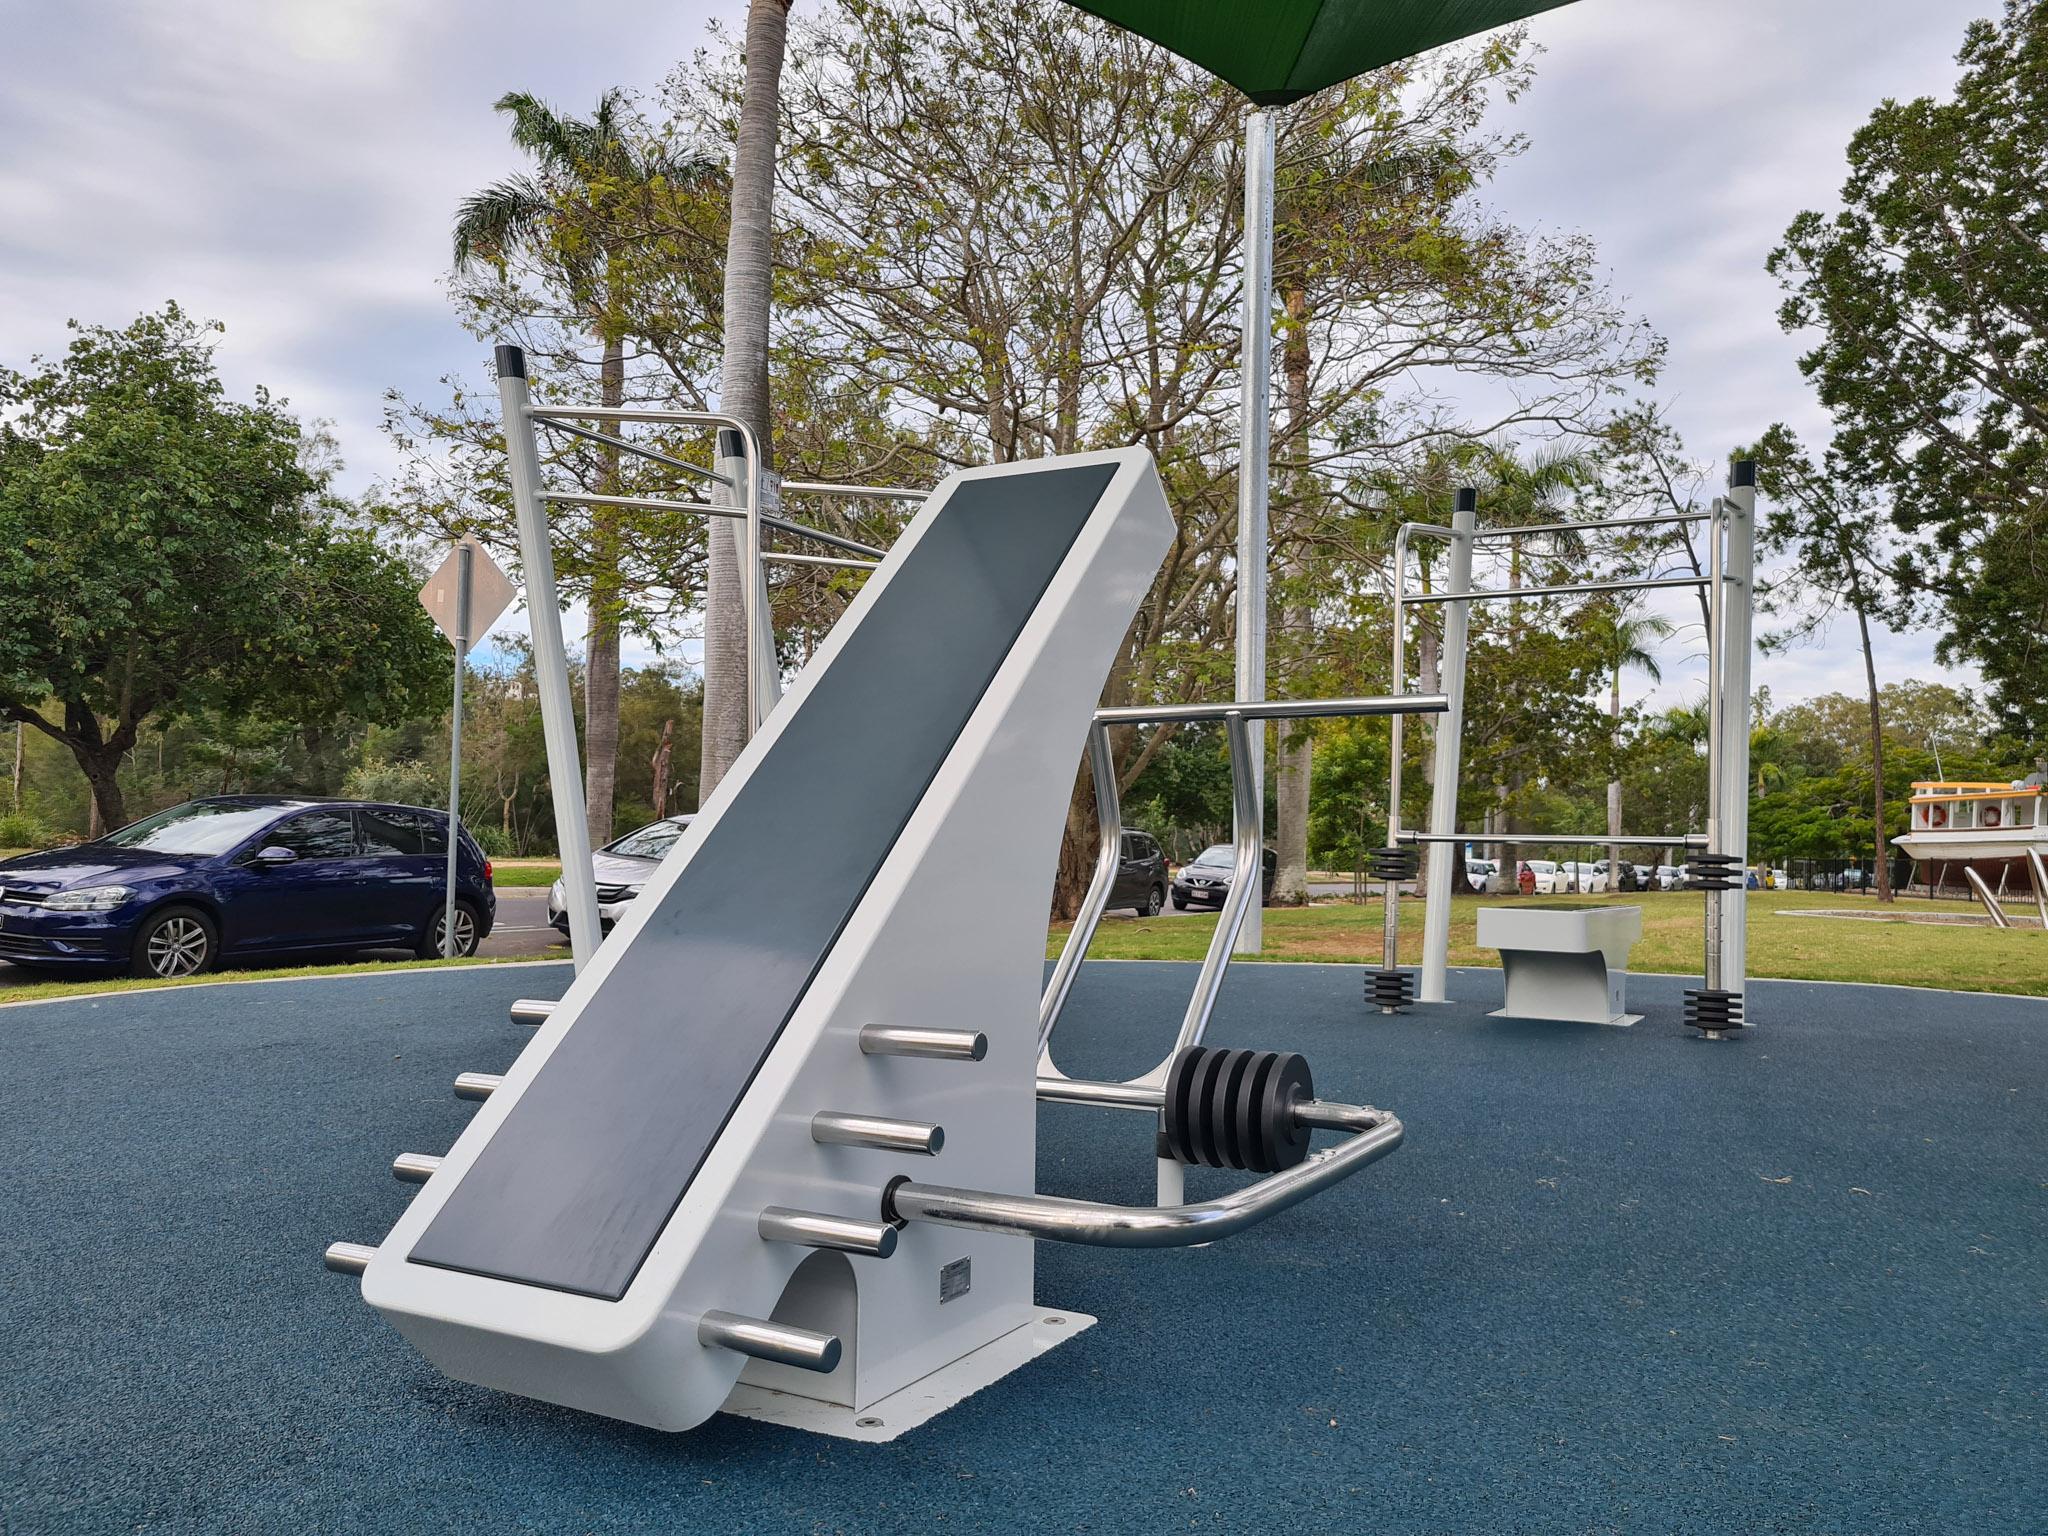 uq-outdoor-fitness-austek-play-brisbane-15